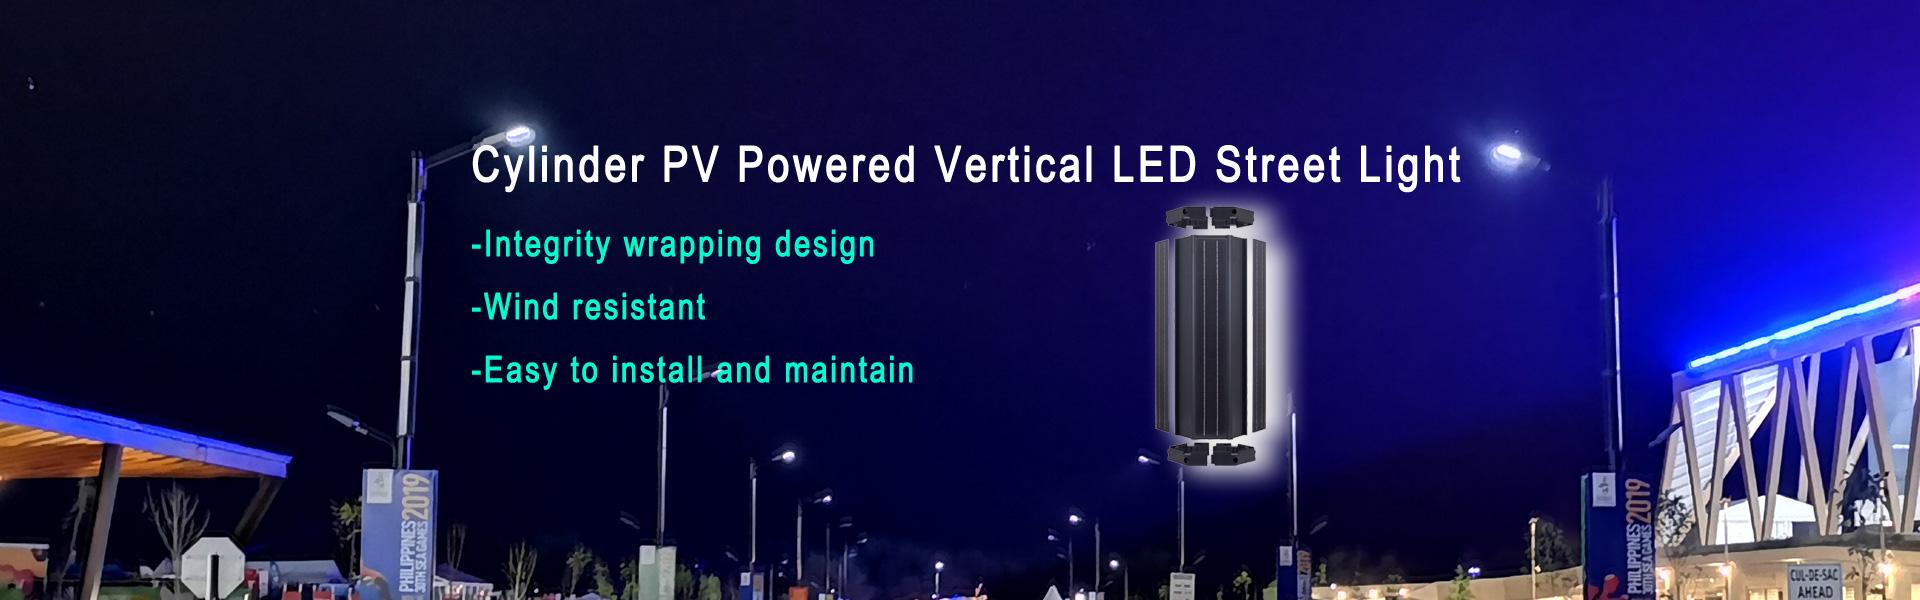 Cylinder PV Powered Vertical LED Street Light